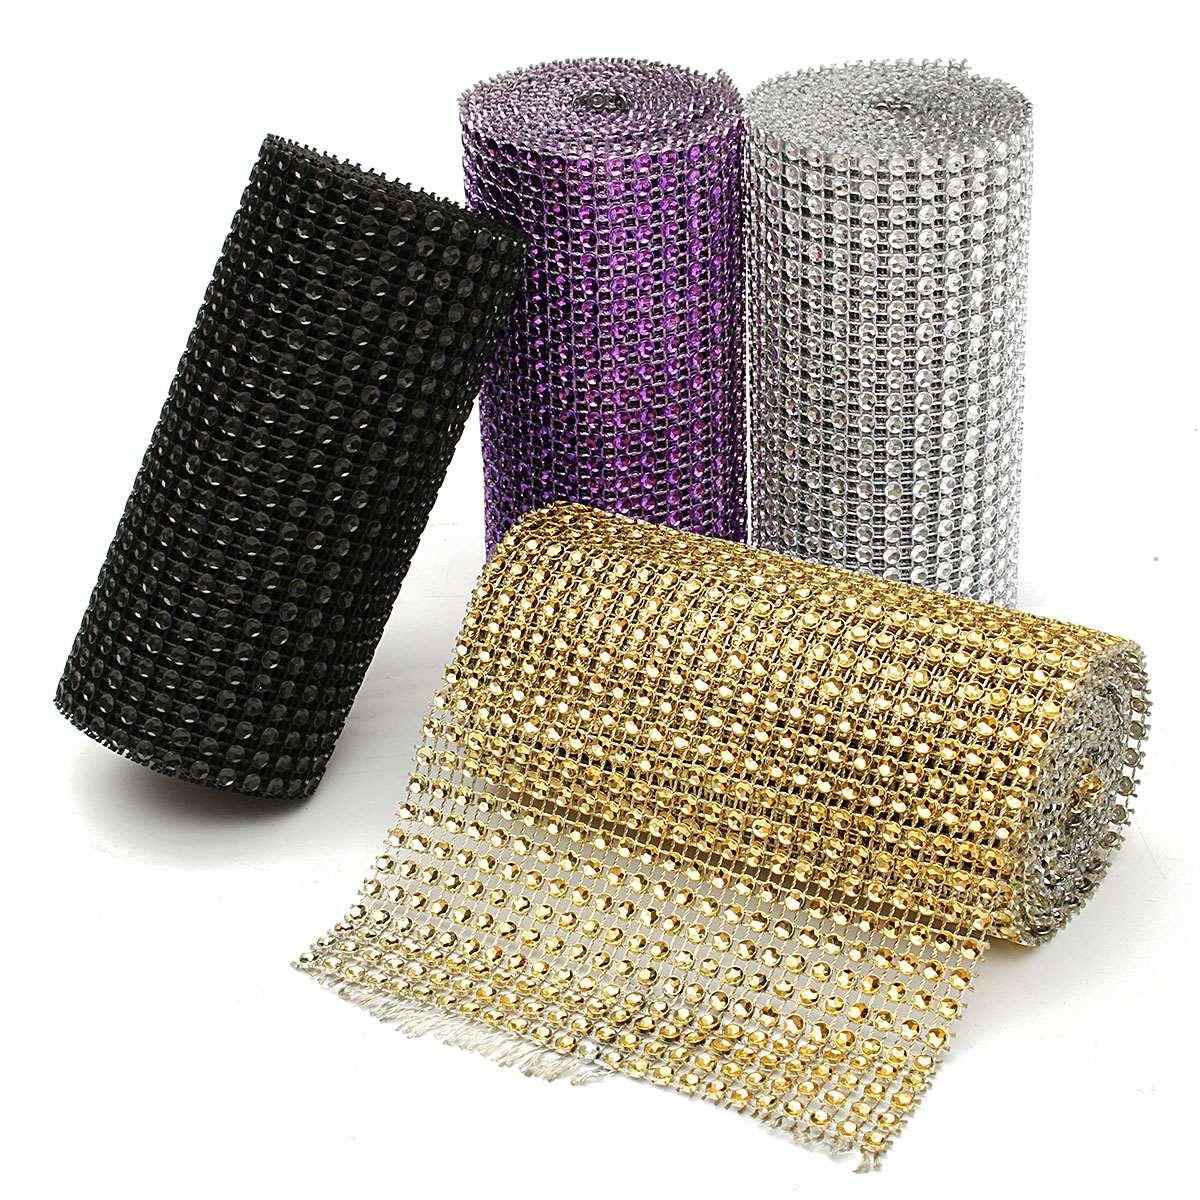 Silver-Diamond-Rhinestone-Ribbon-Wrap-Bulk-DIY-Bling-Birthday-Bridal-Shower-Wedding-Cake-Vase-Decorations-Party-Supplies-2-Yard